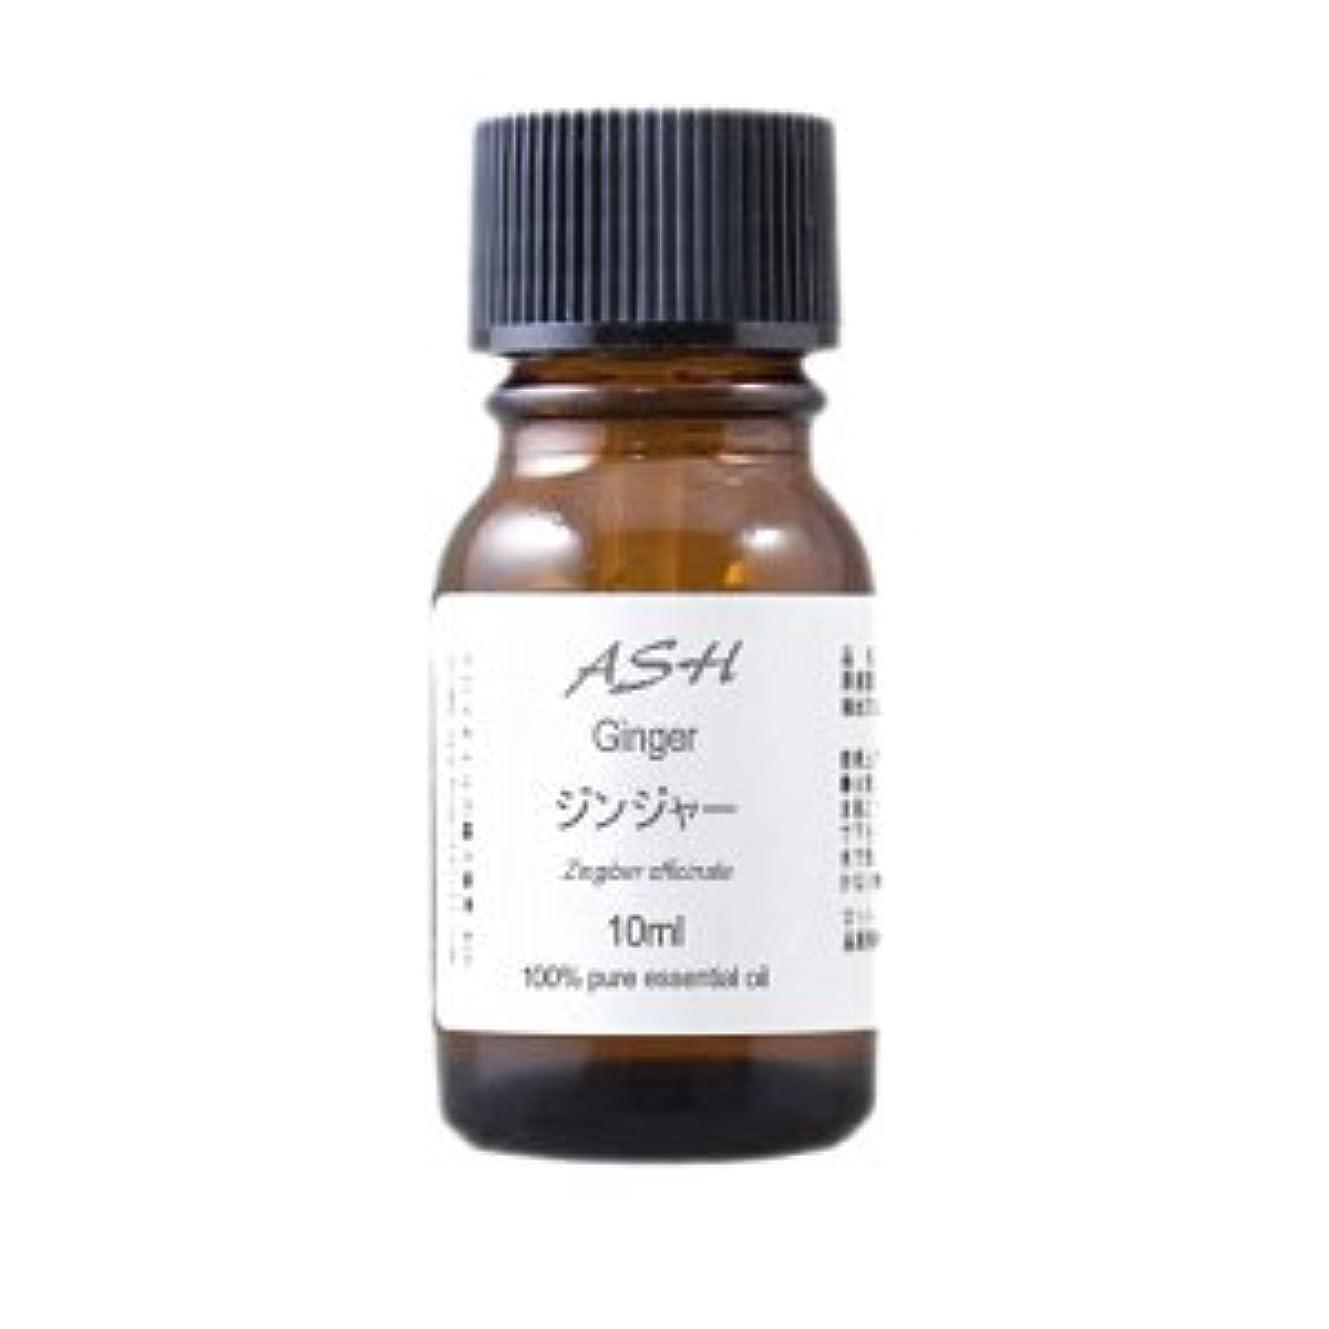 ASH ジンジャー エッセンシャルオイル 10ml AEAJ表示基準適合認定精油